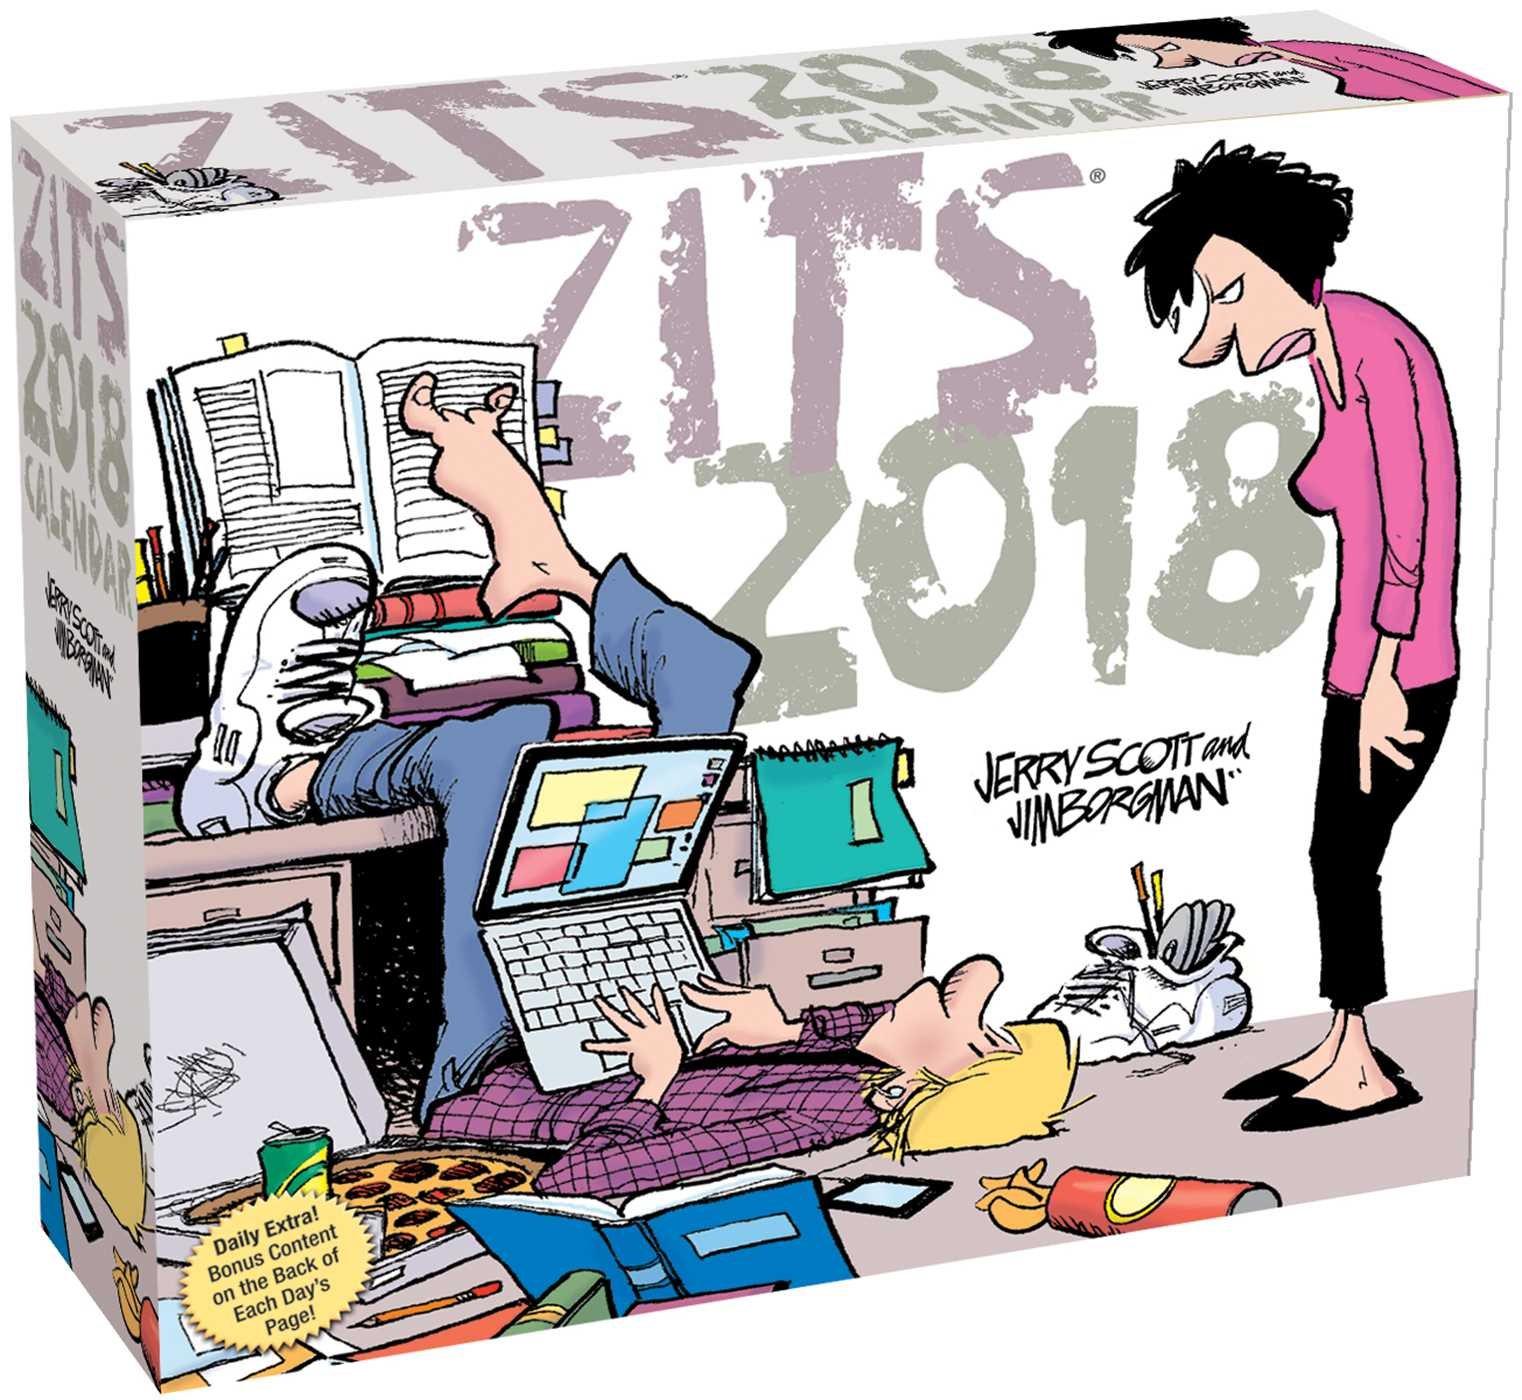 Zits 2018 Day-to-Day Calendar pdf